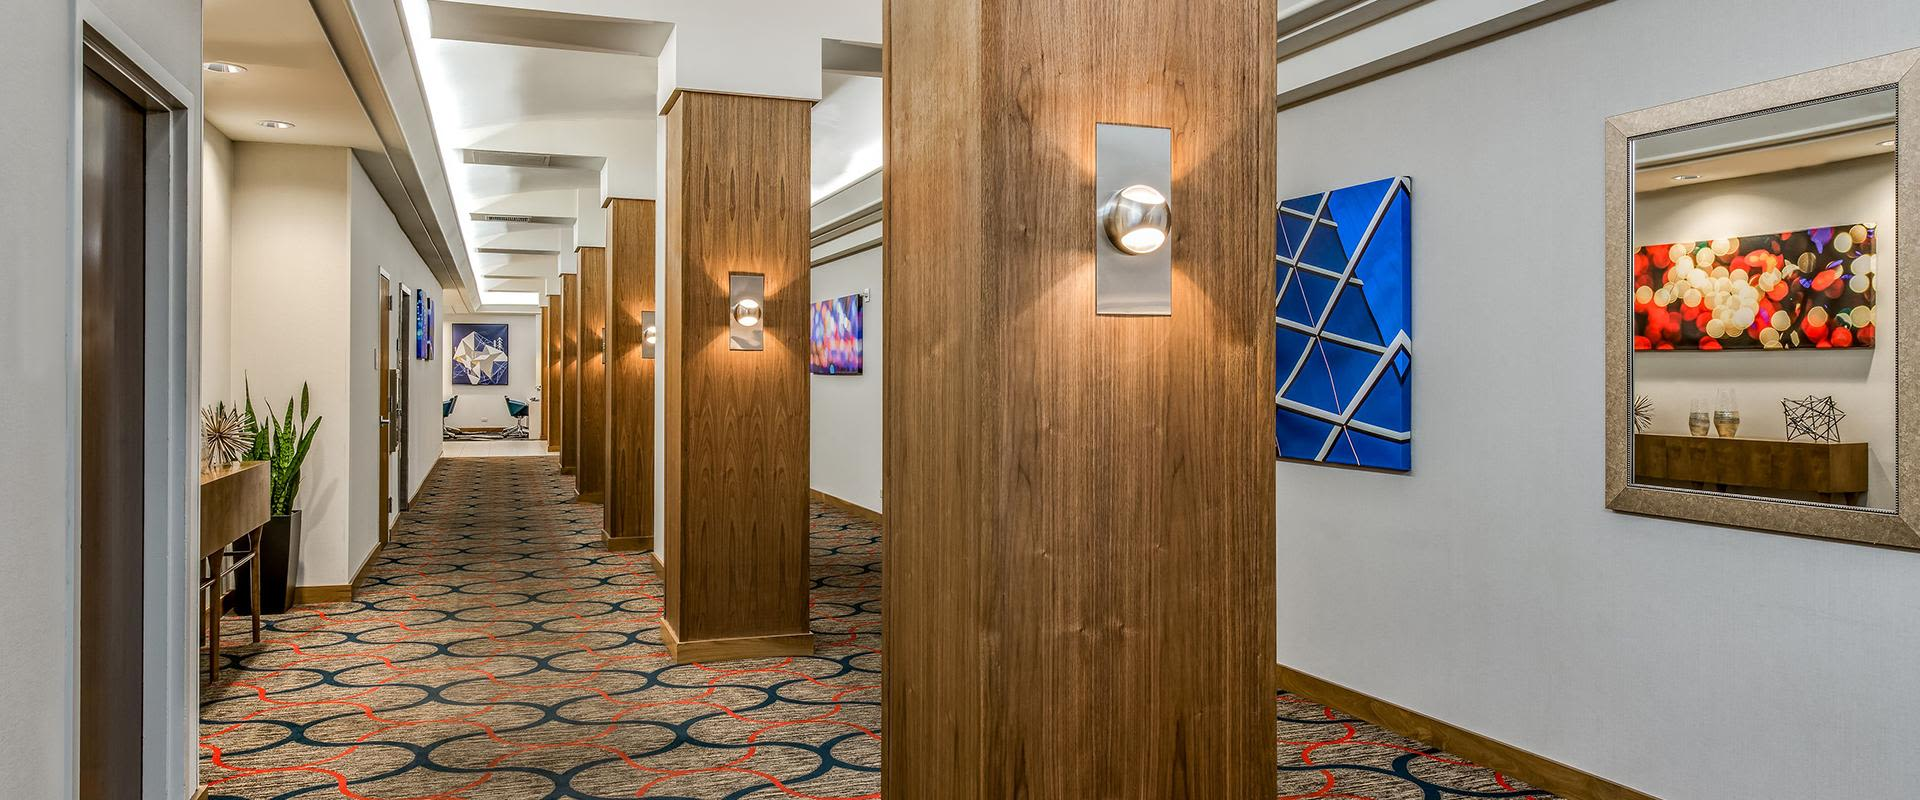 Denver Hotel Reception Area